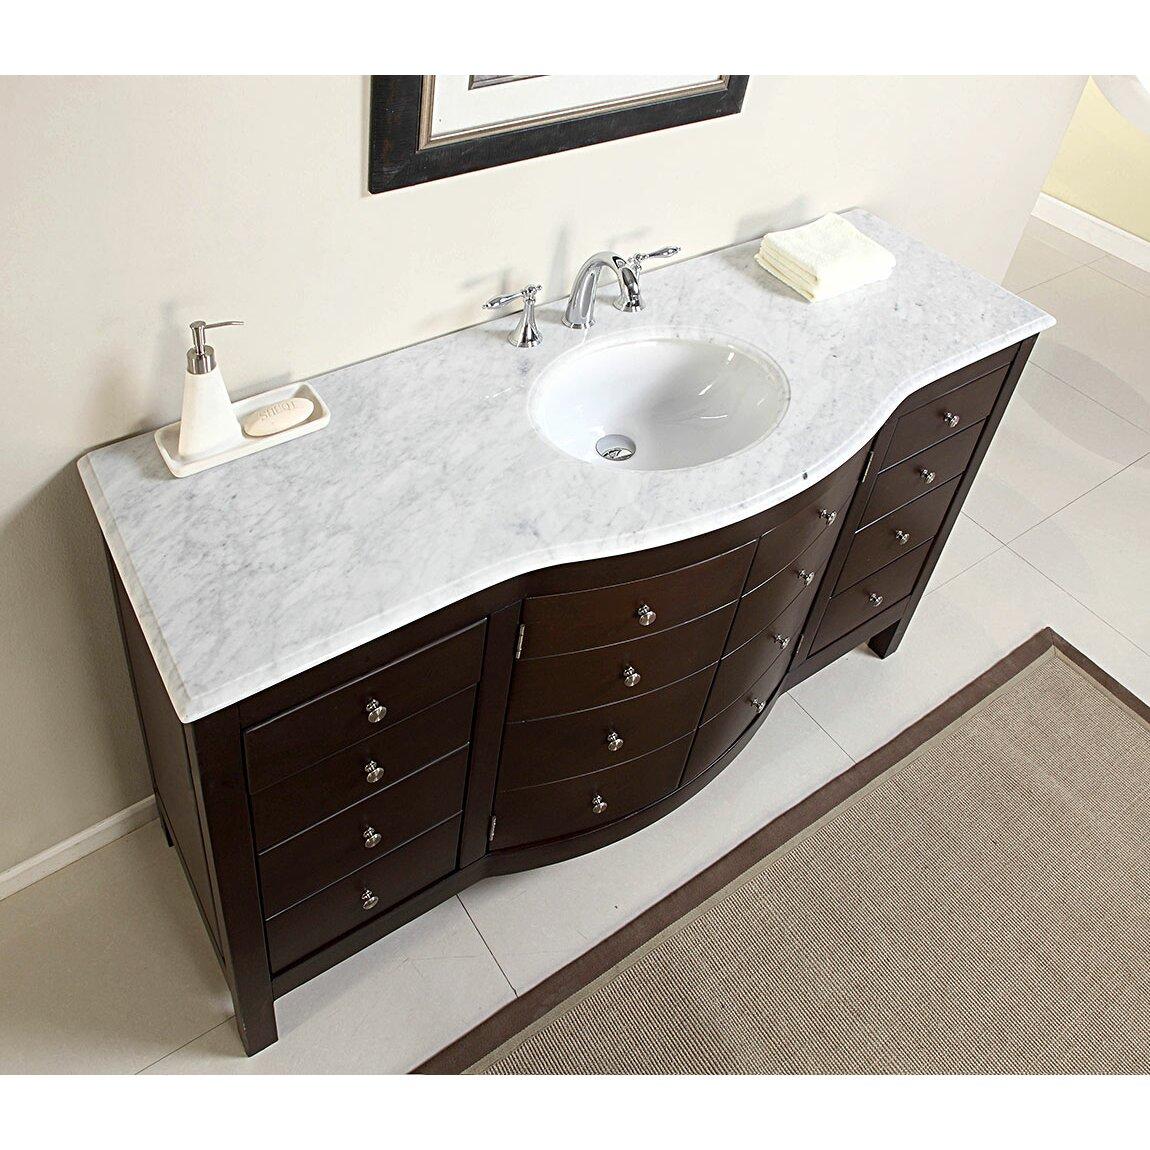 Playboy Bathroom Set | newsdigestng.com